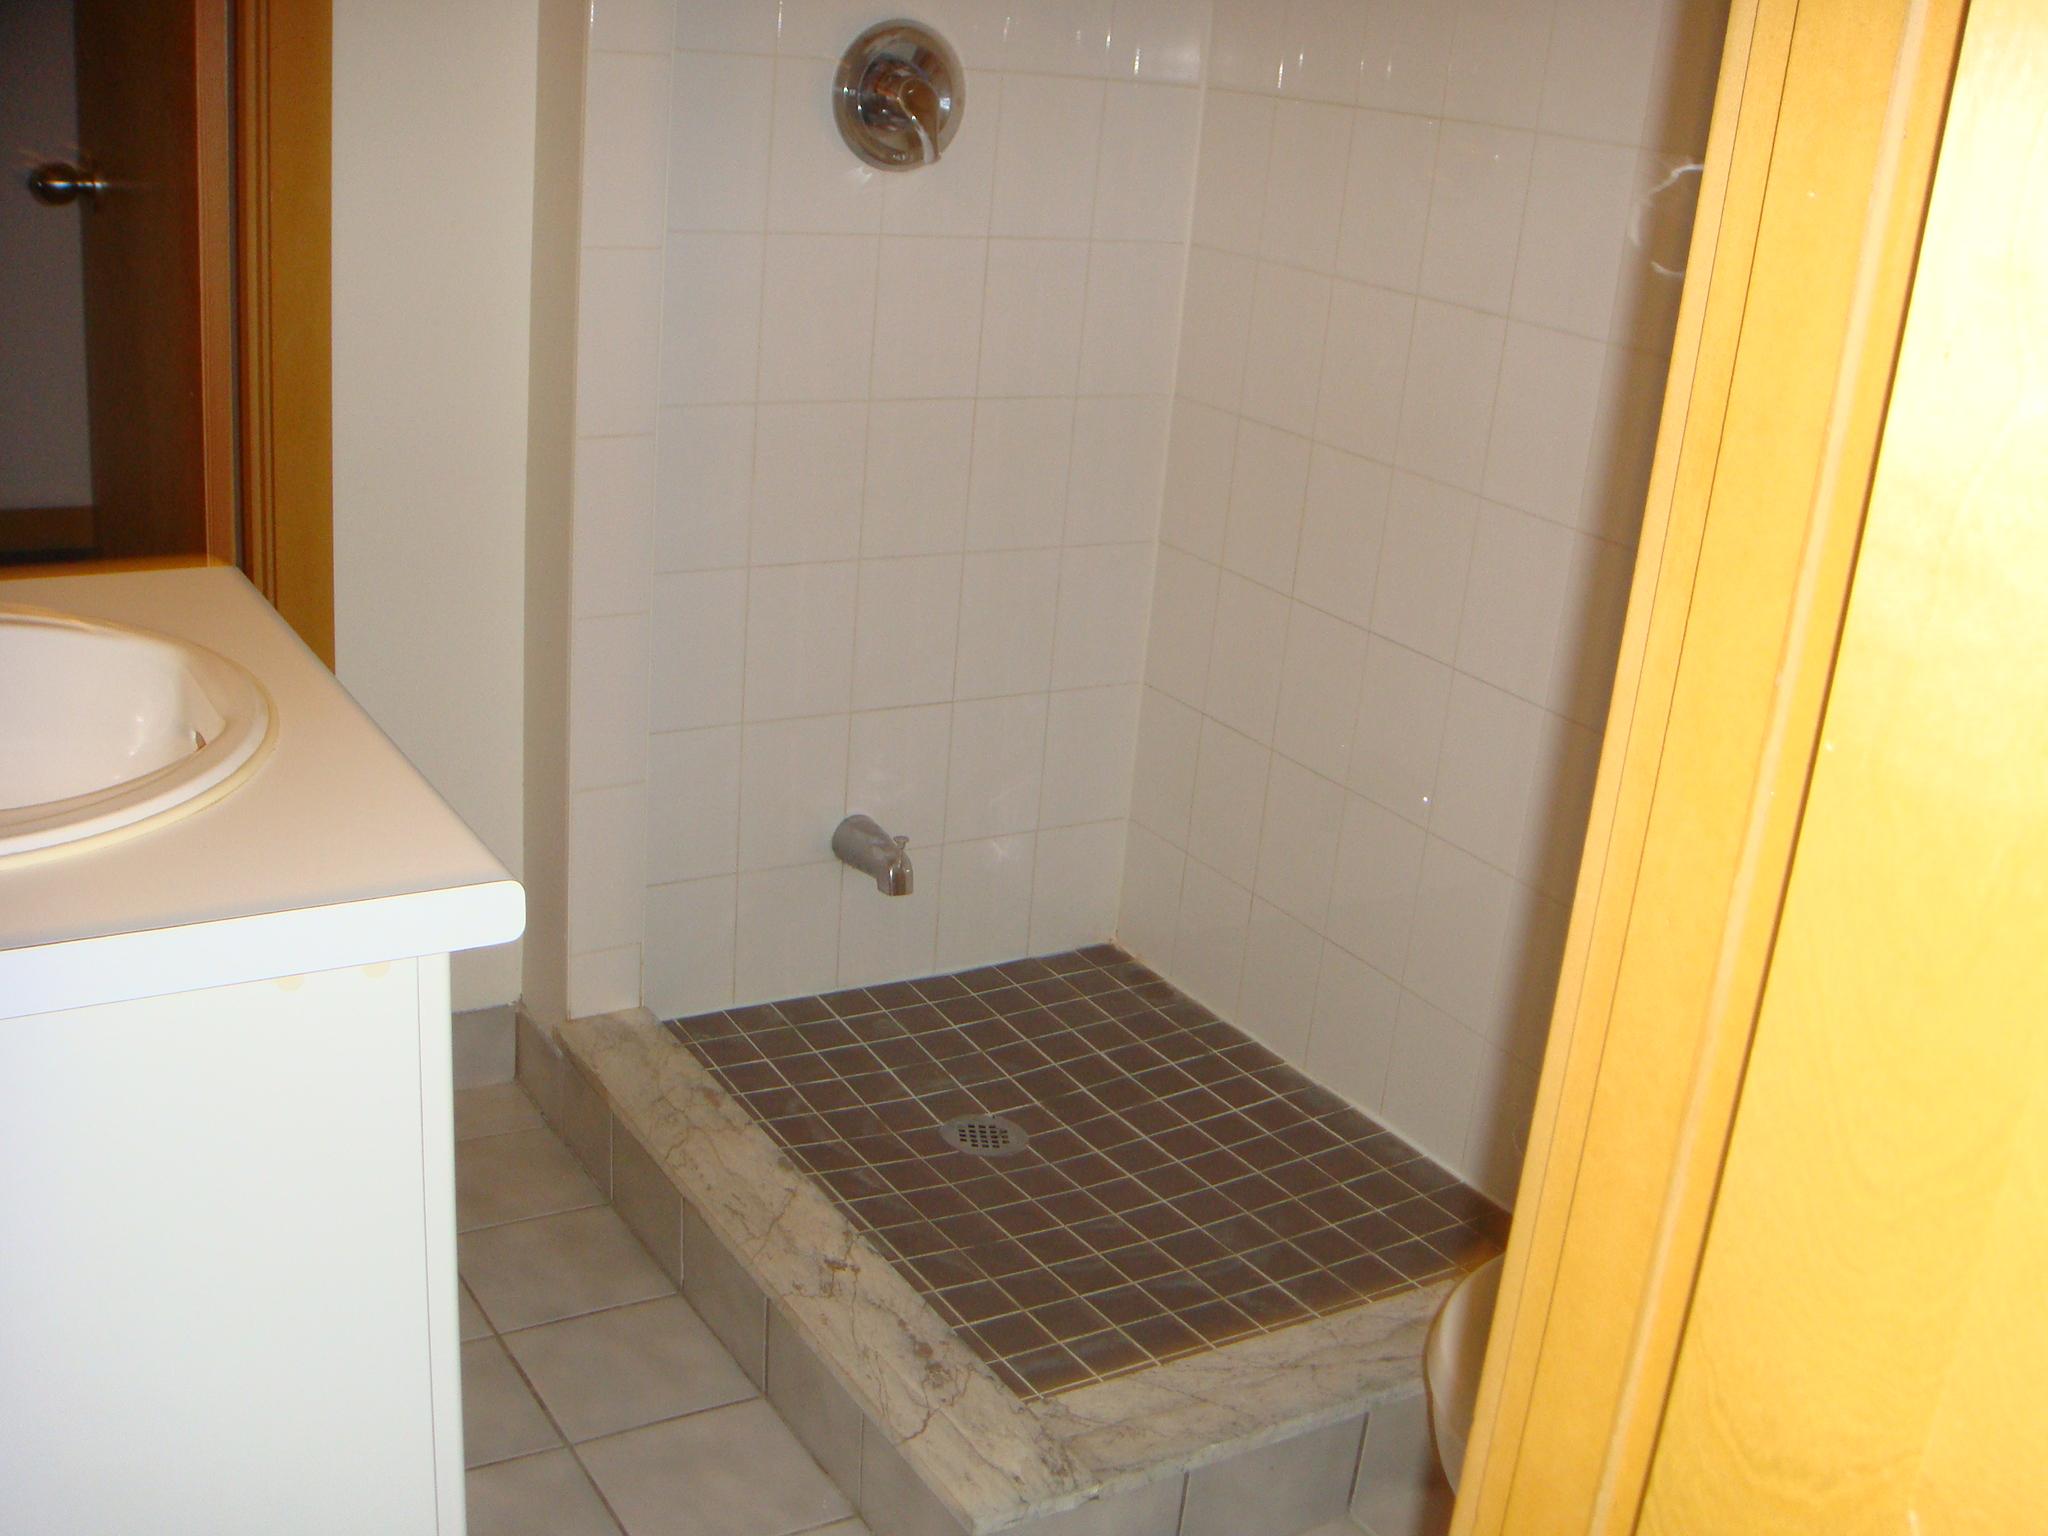 Unit 17 shower - 1 of 2